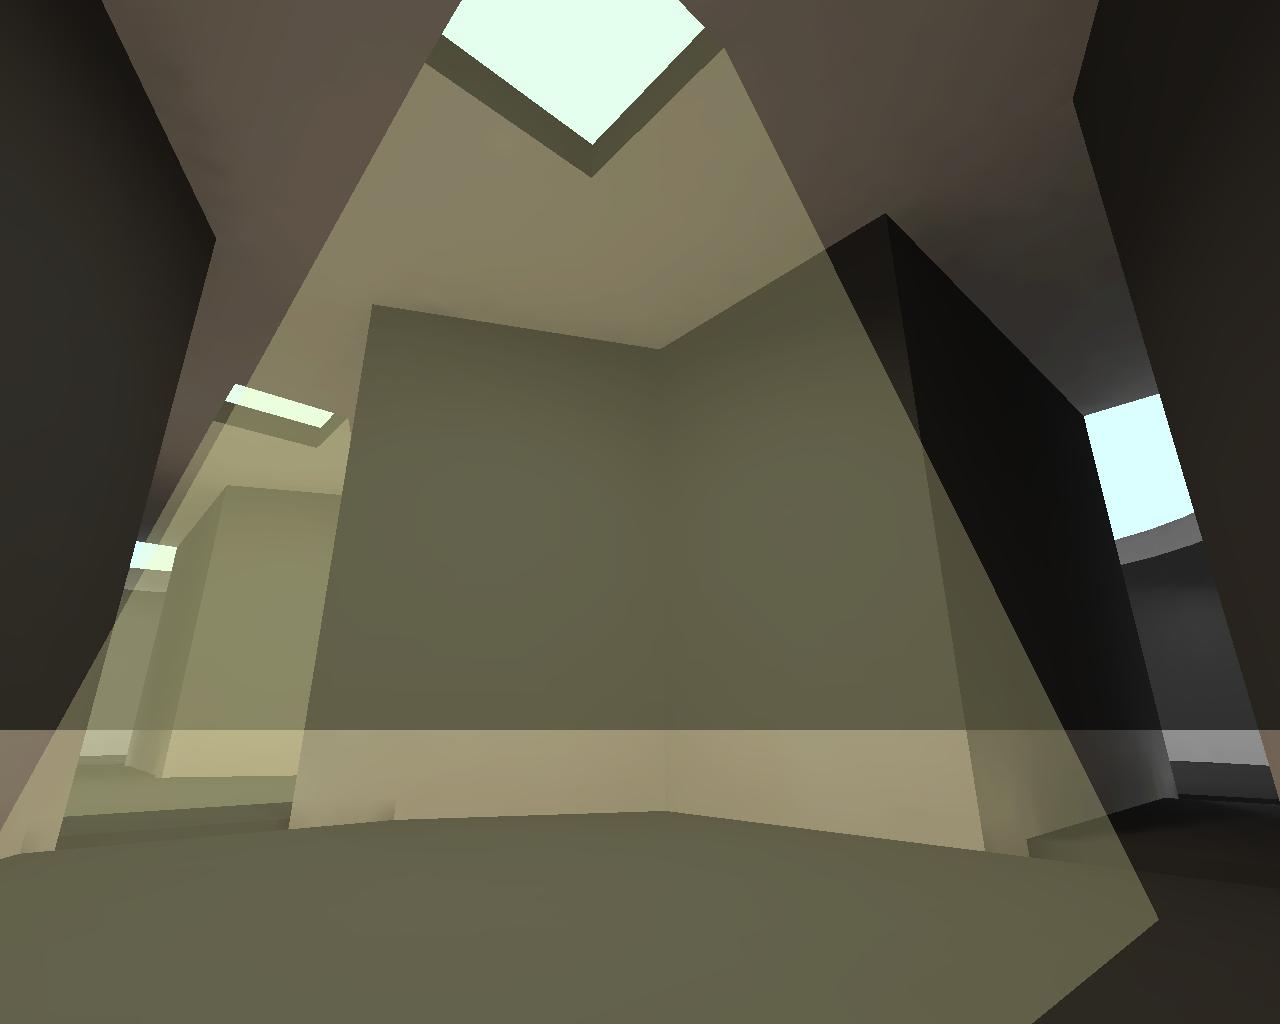 minimalism0004.png - Half-Life